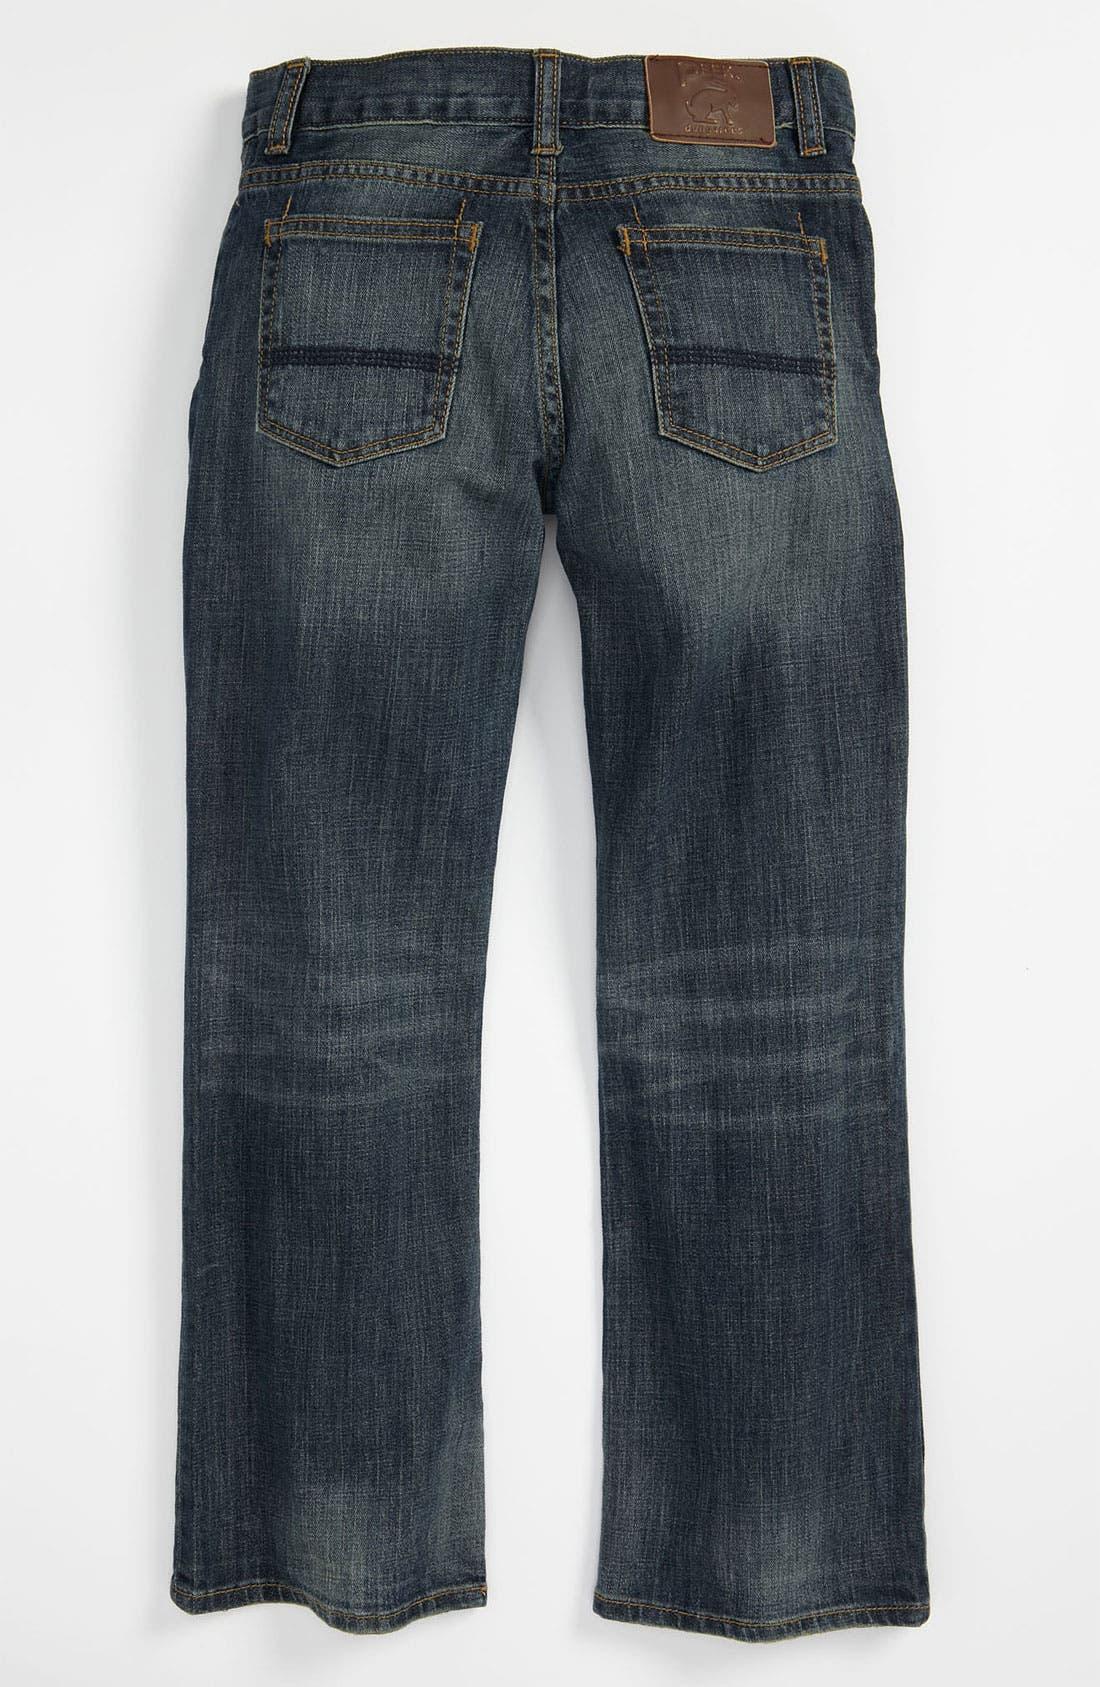 Alternate Image 1 Selected - Peek 'Sullivan' Jeans (Toddler, Little Boys & Big Boys)